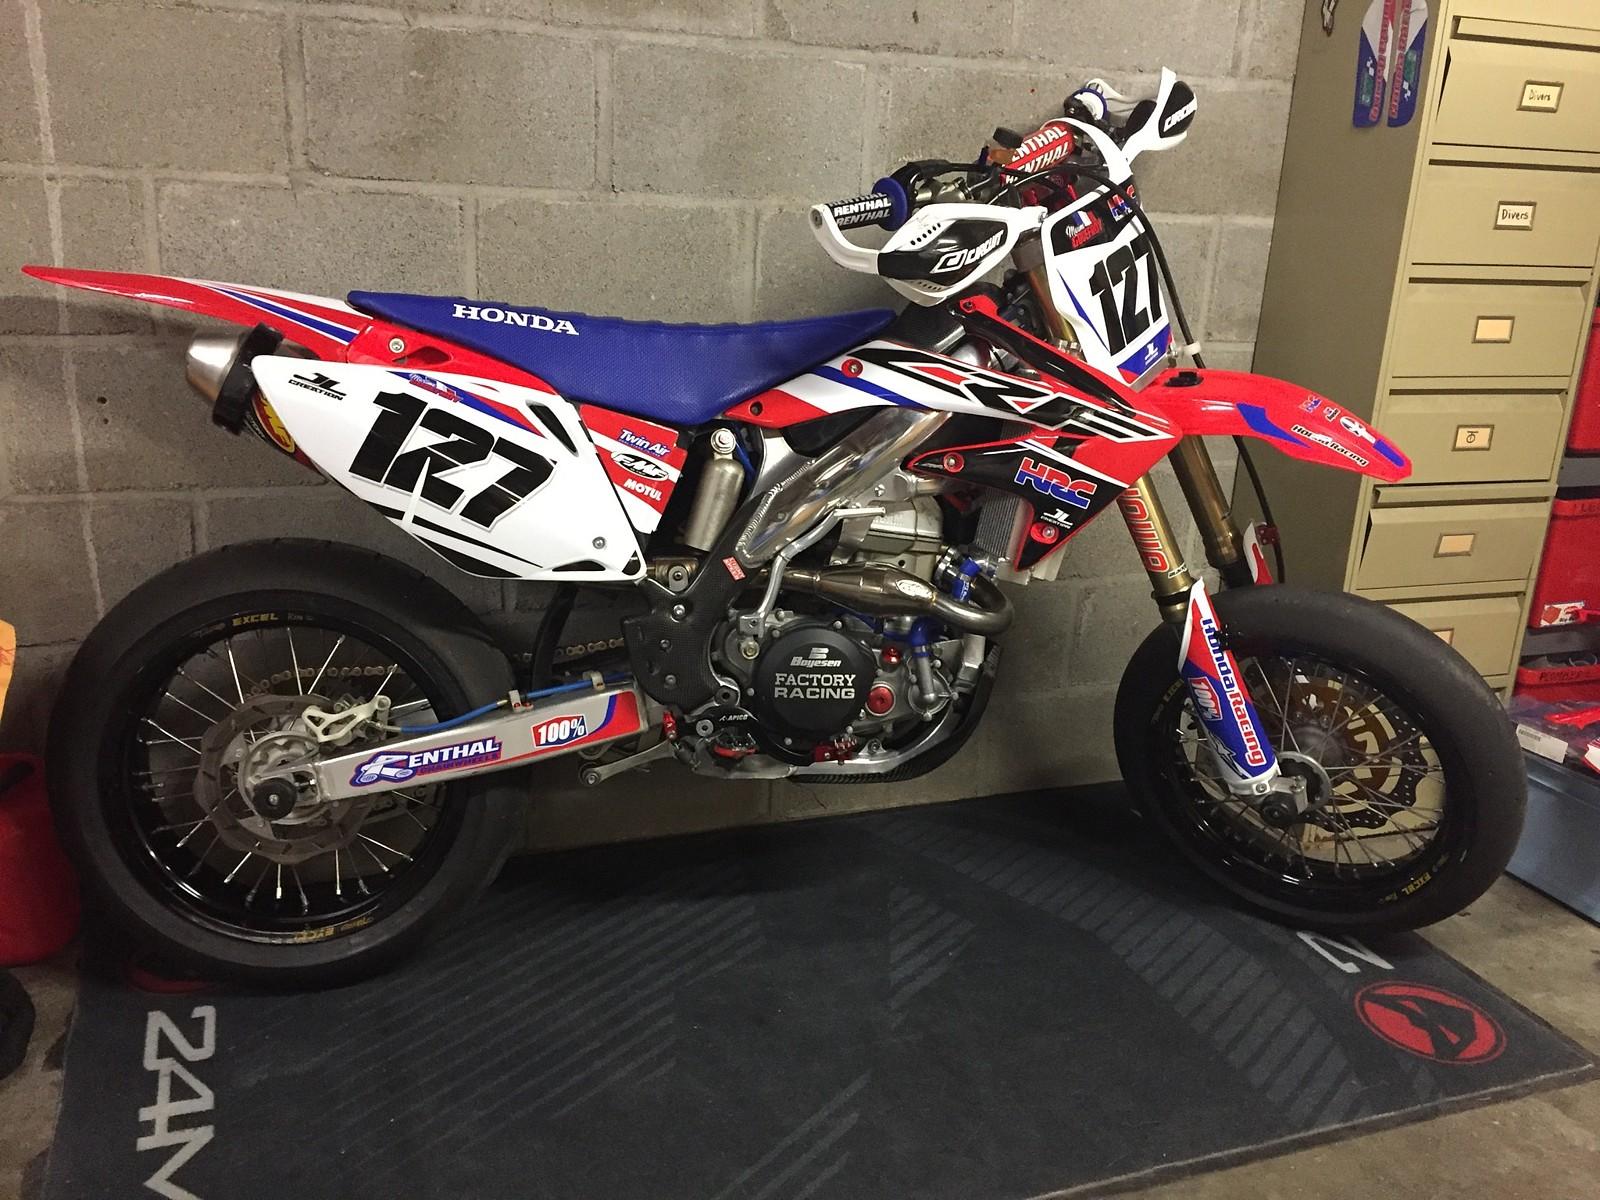 5991DD12-7B12-4481-AE19-2EA5598D146D - Godcho - Motocross Pictures - Vital MX